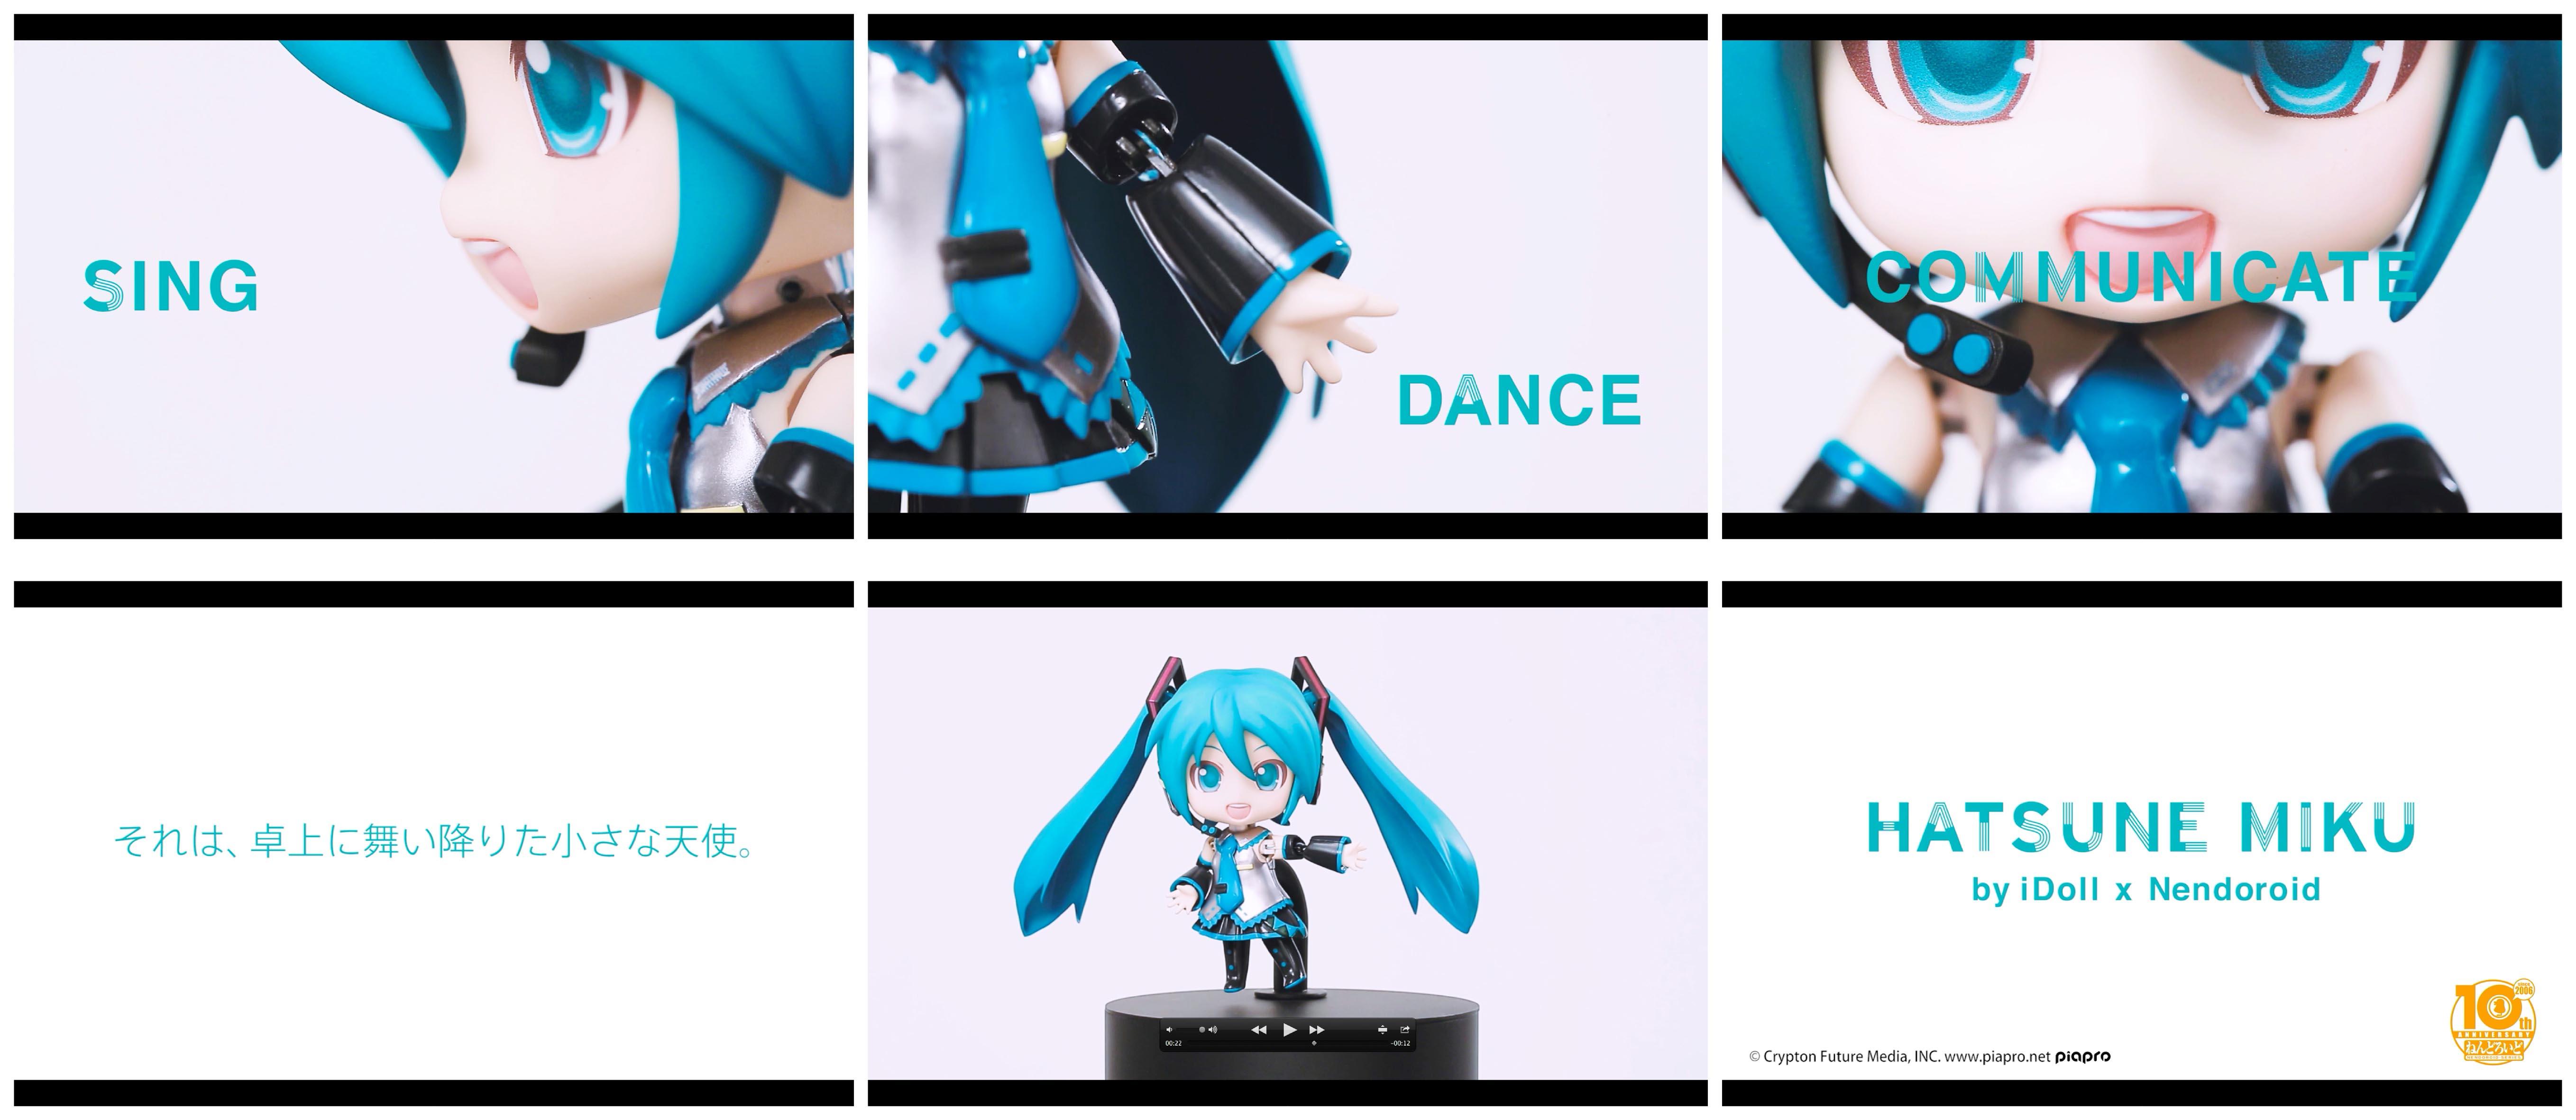 「HATSUNE MIKU by iDoll x Nendoroid」特設サイト